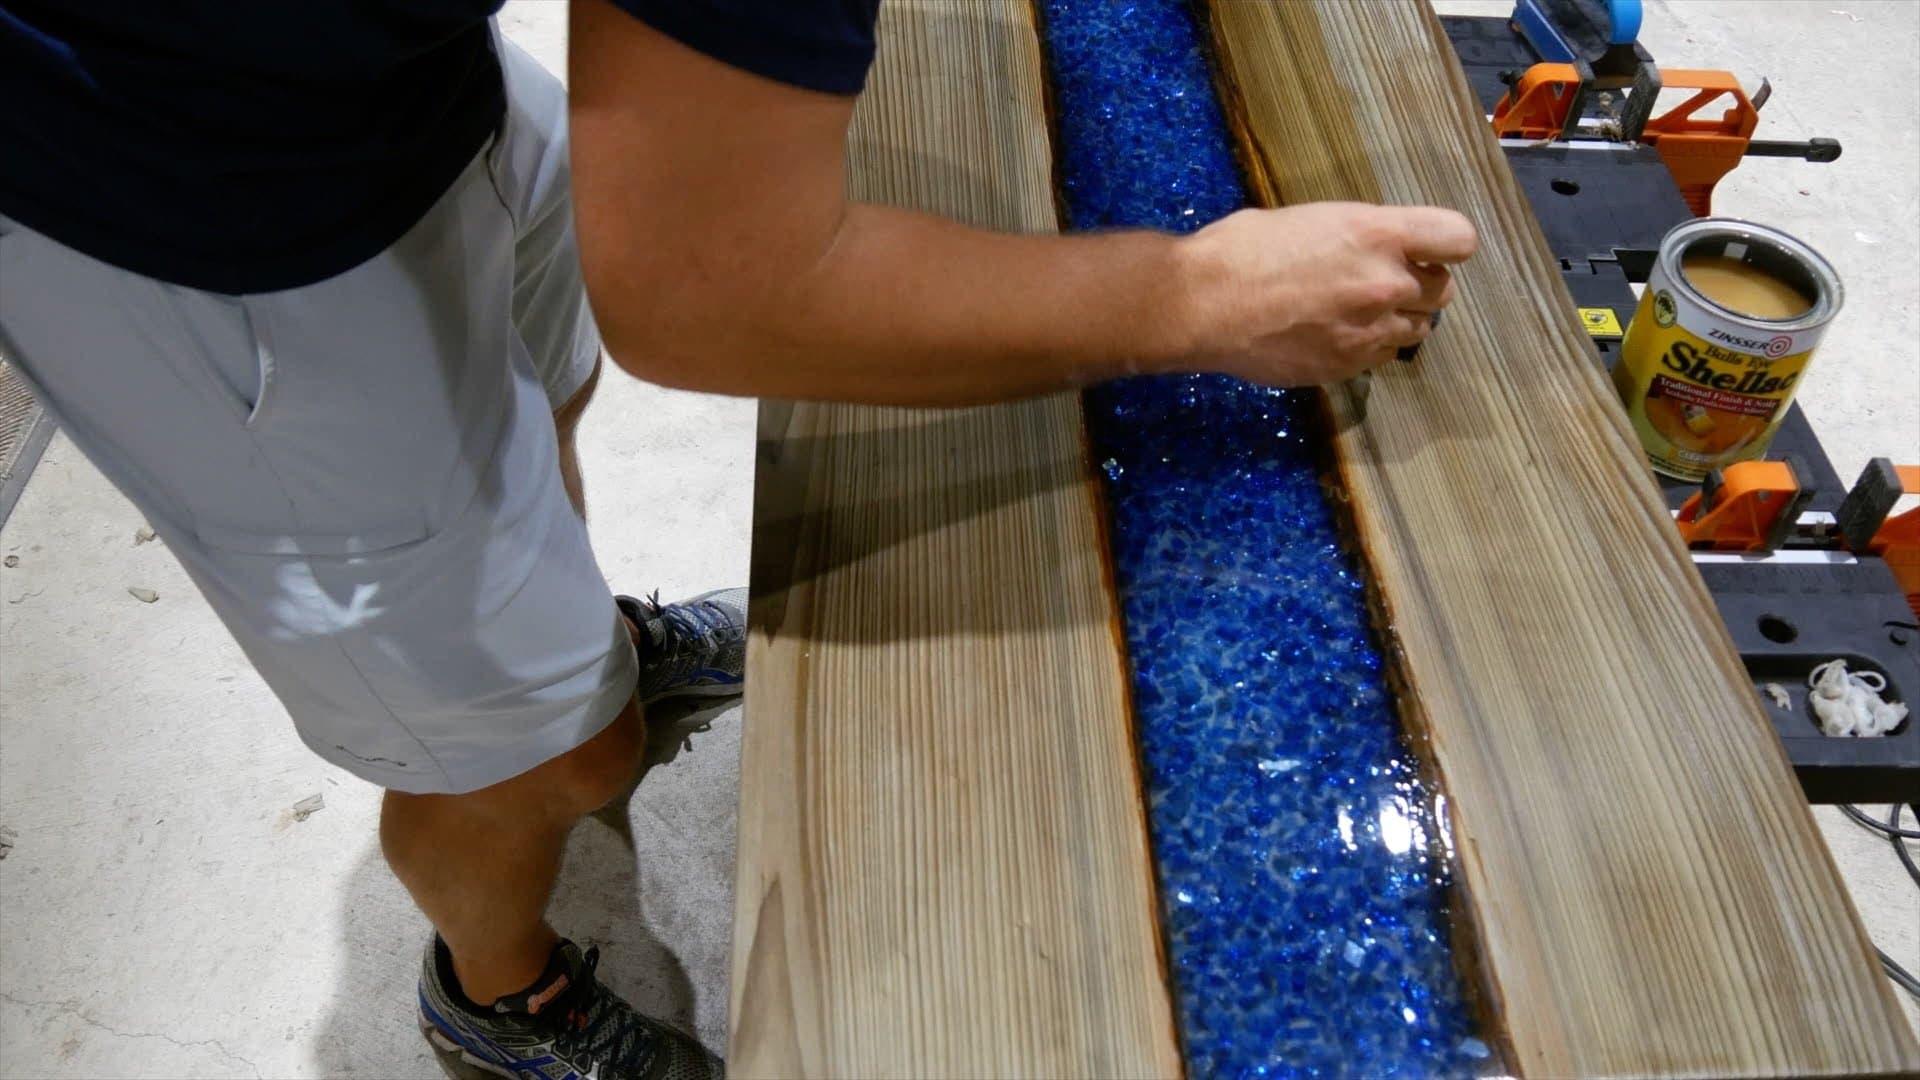 epoxy-resin-river-table-glowpowder_20171016_80